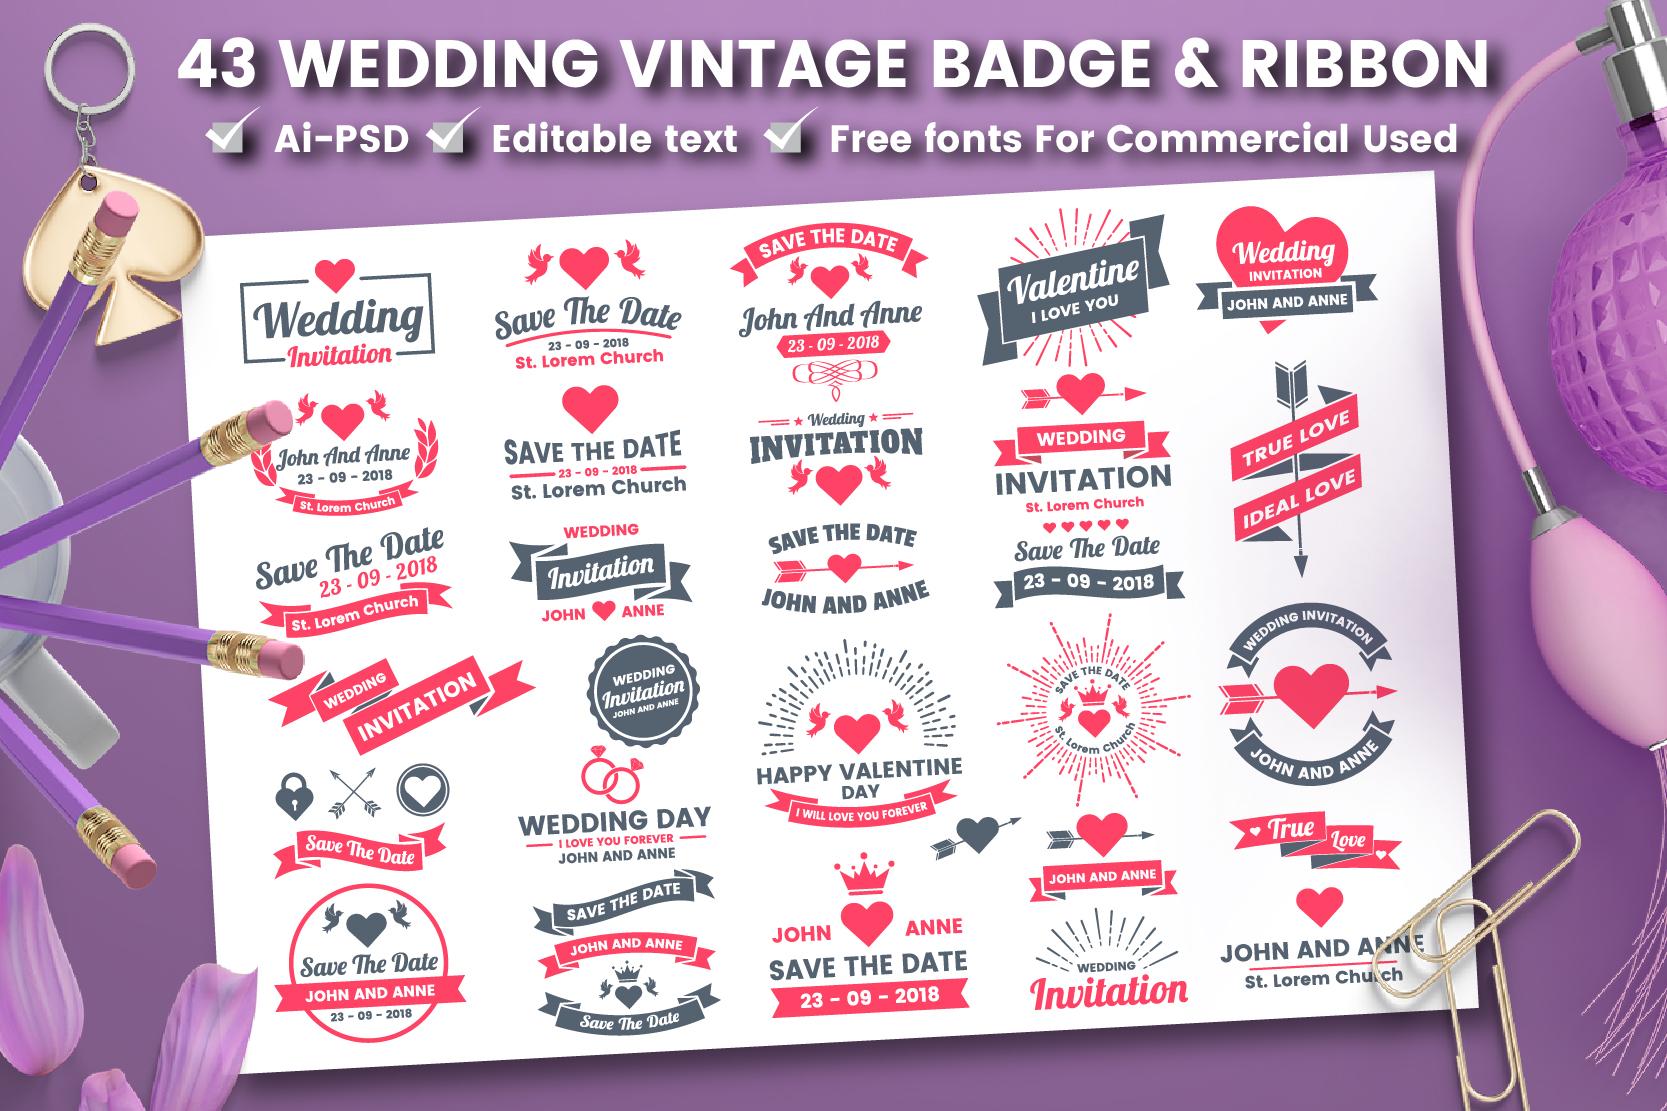 43 WEDDING VINTAGE BADGE & RIBBON example image 1